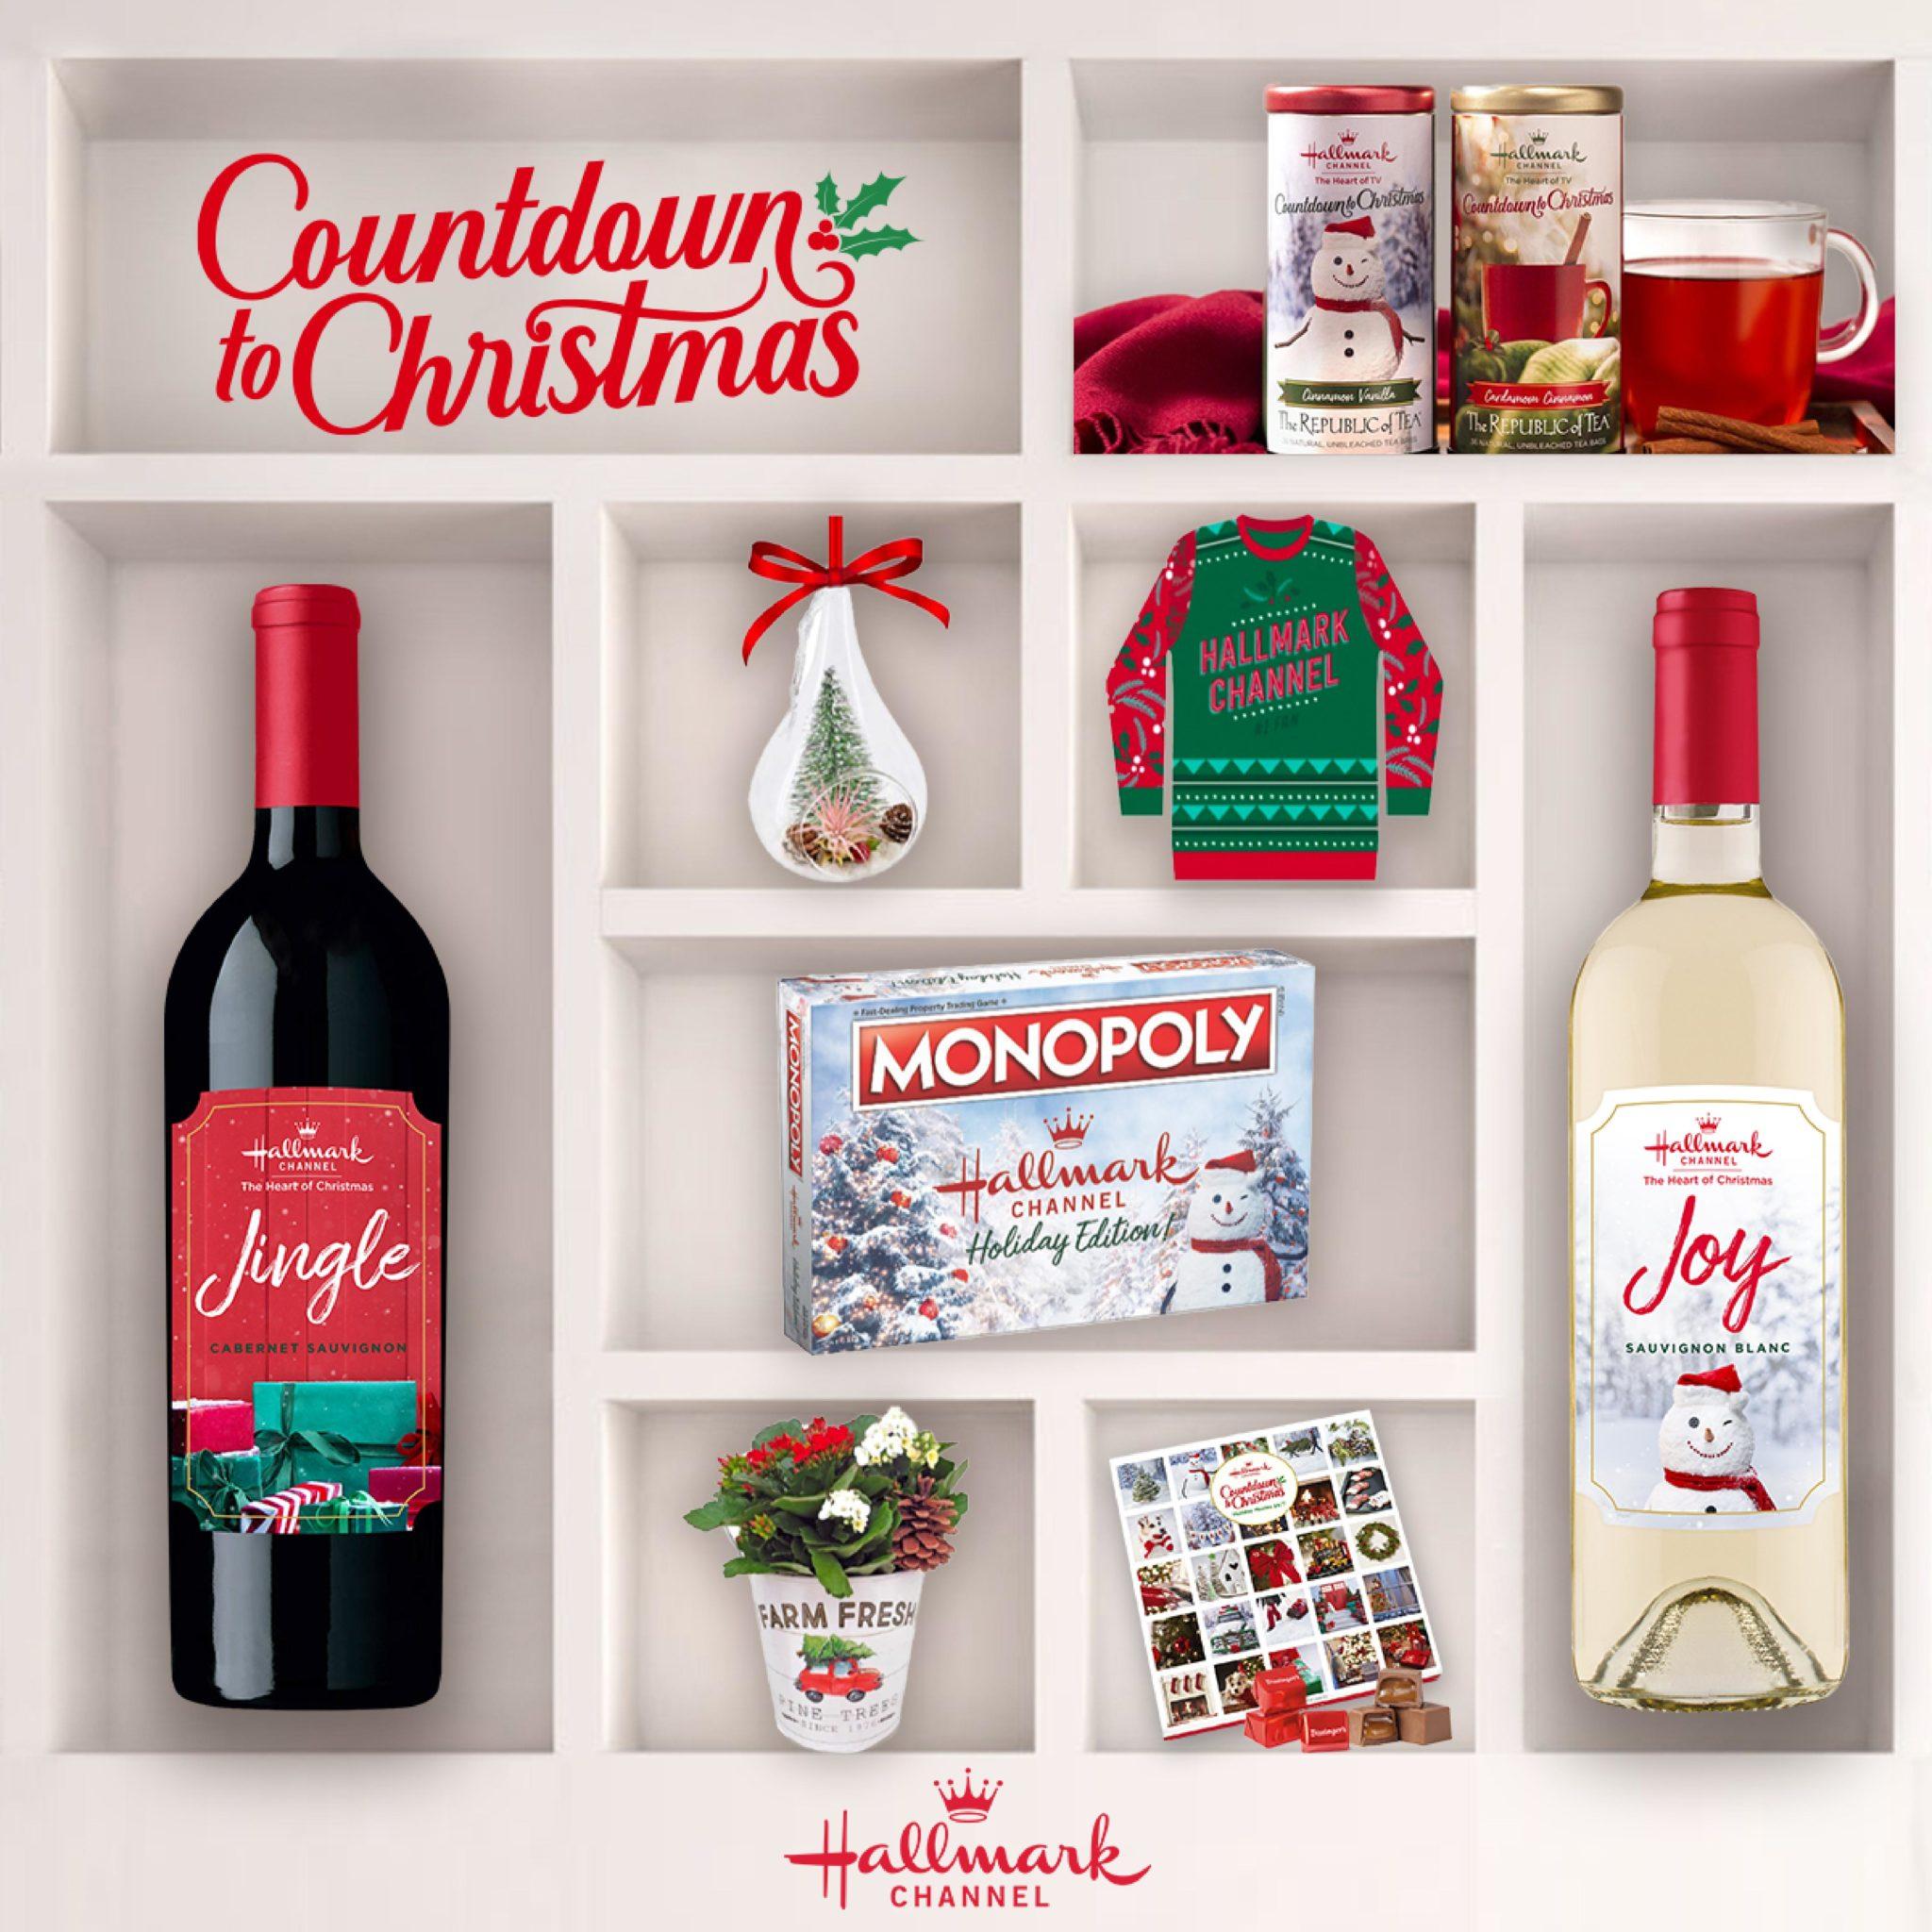 Hallmark Holiday Products